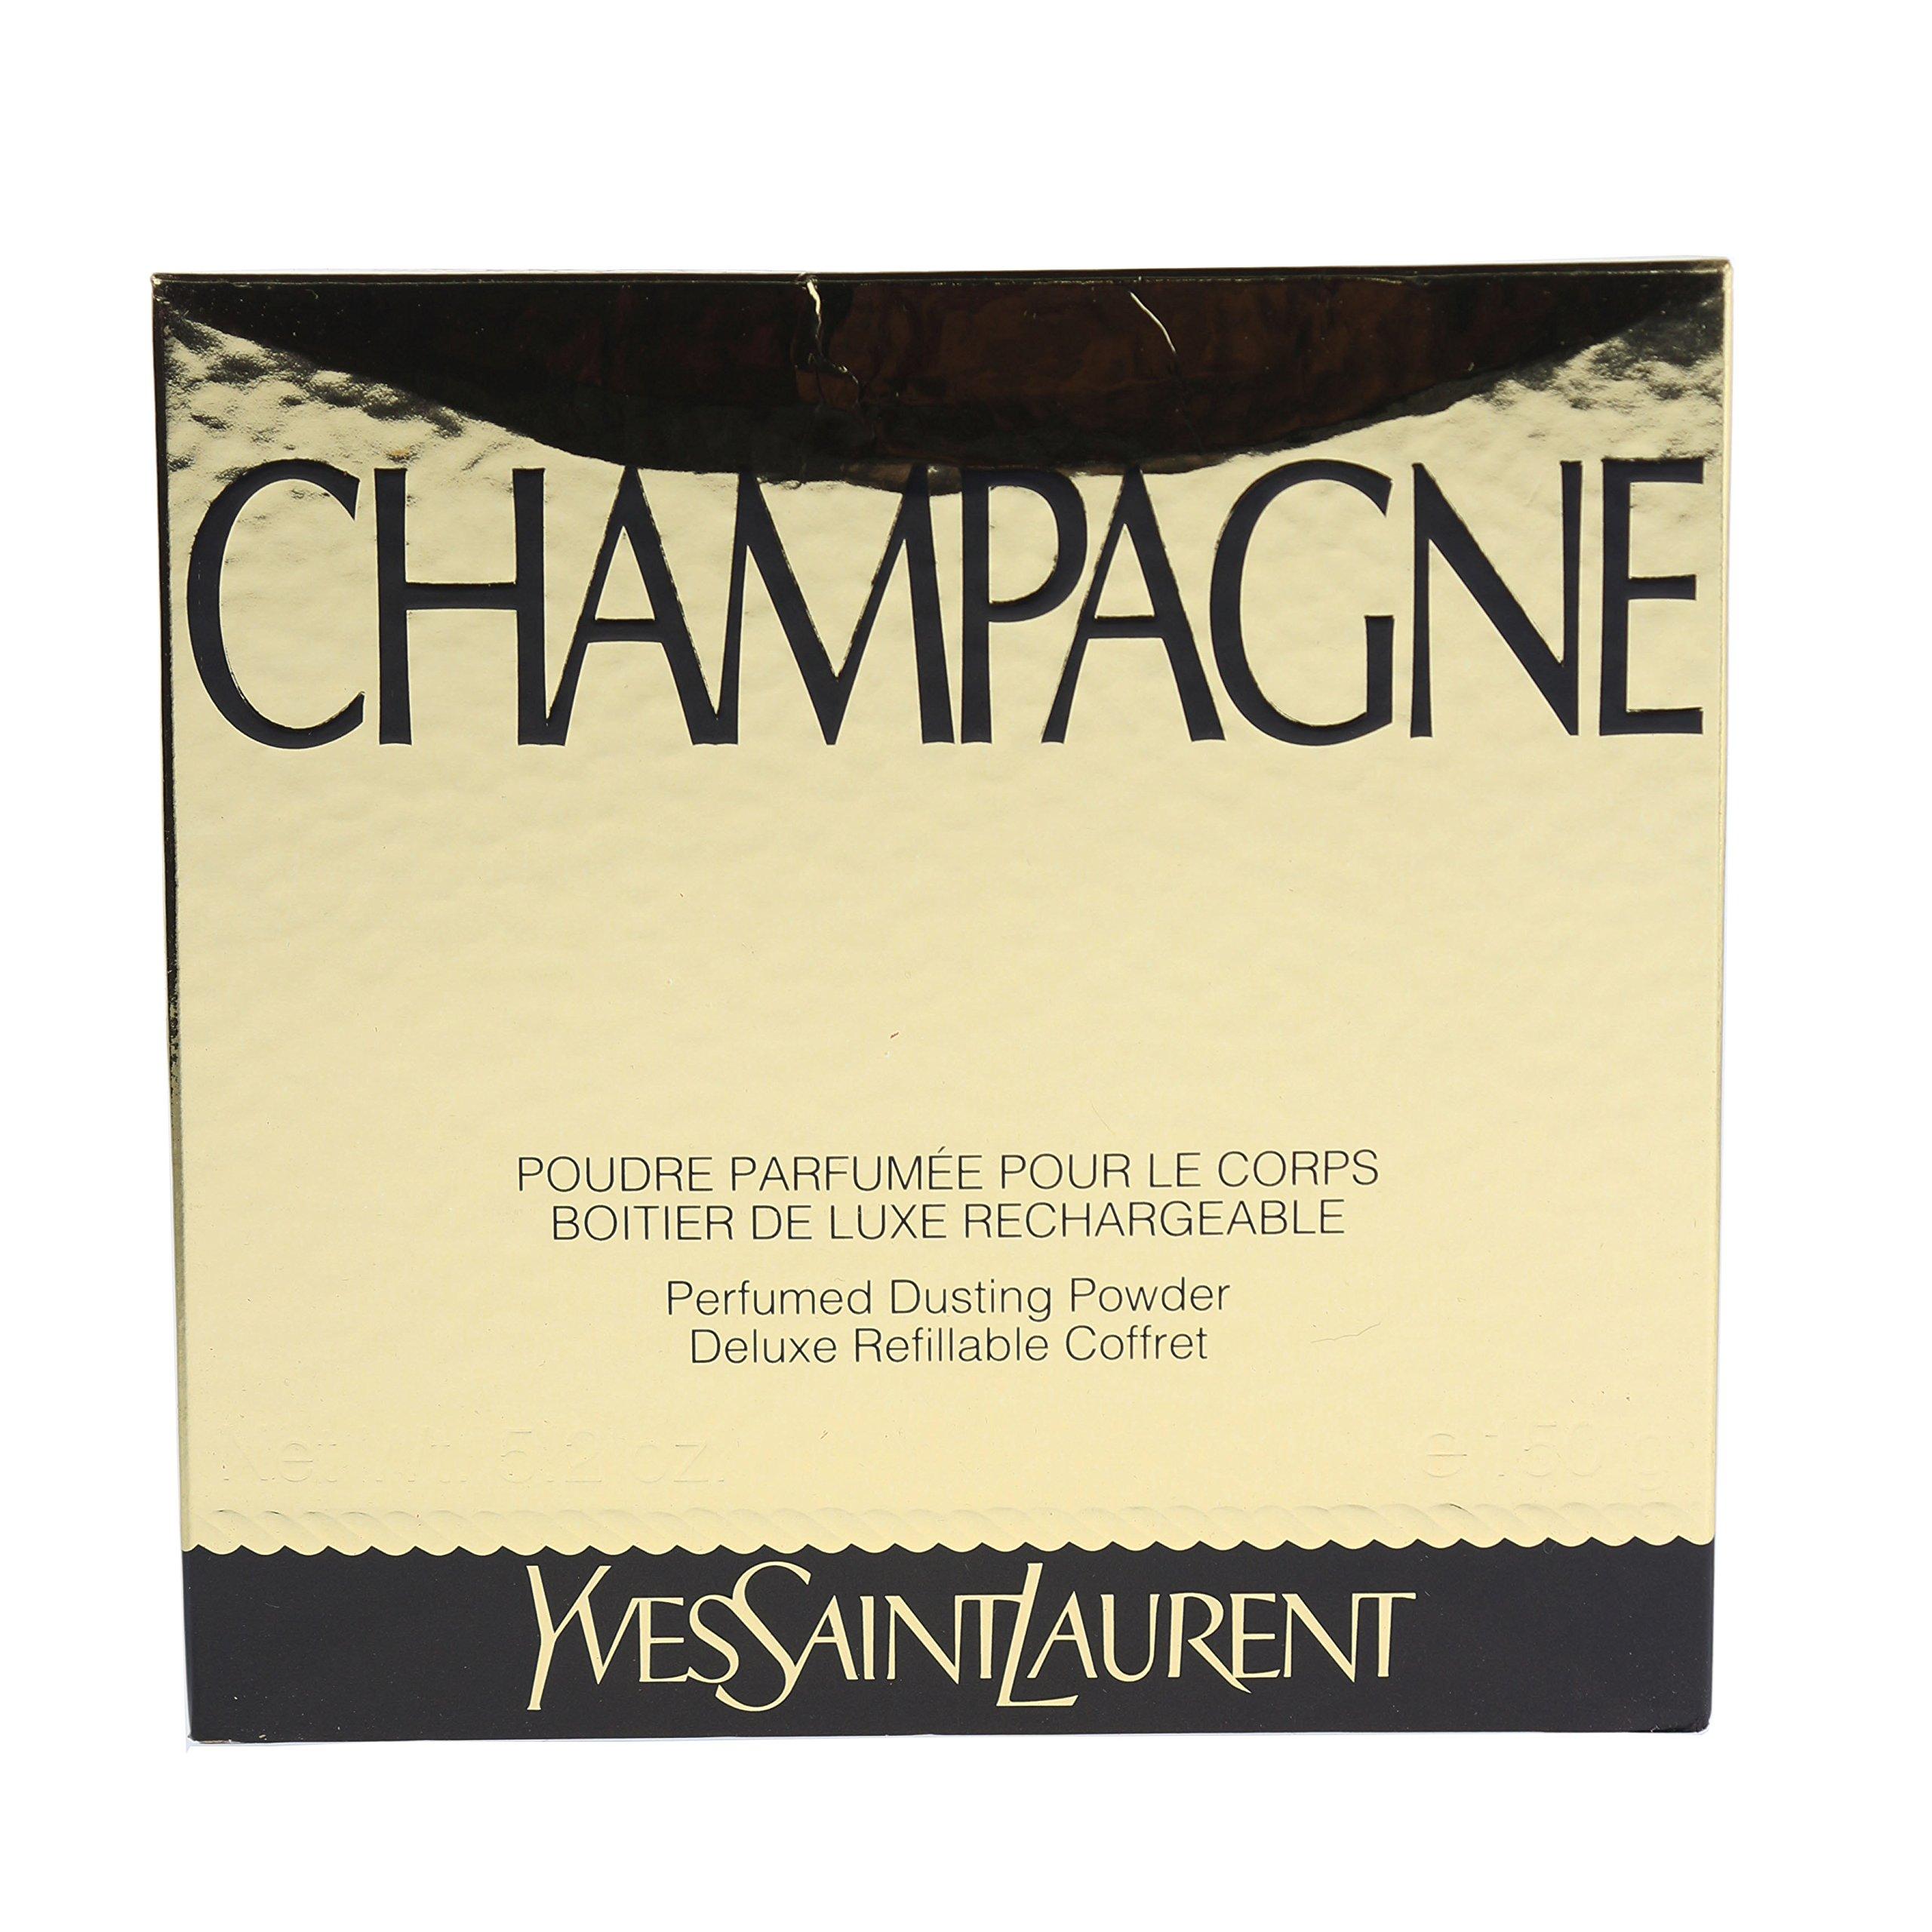 Yves Saint Laurent 'Champagne' Perfumed Dusting Powder 5.2oz/147g New In BOx